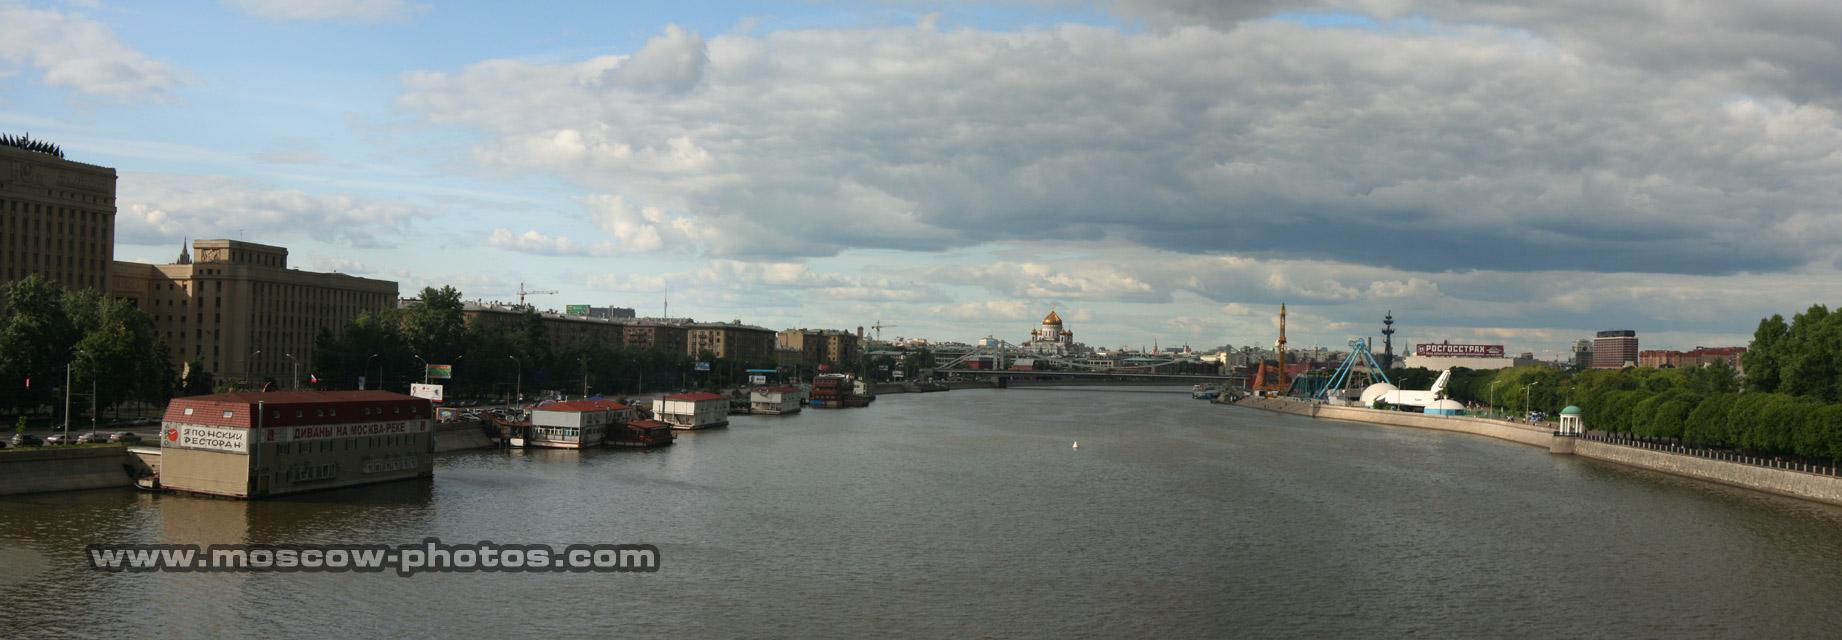 Home > bridges > andreyevsky bridge > view from andreyevsky bridge